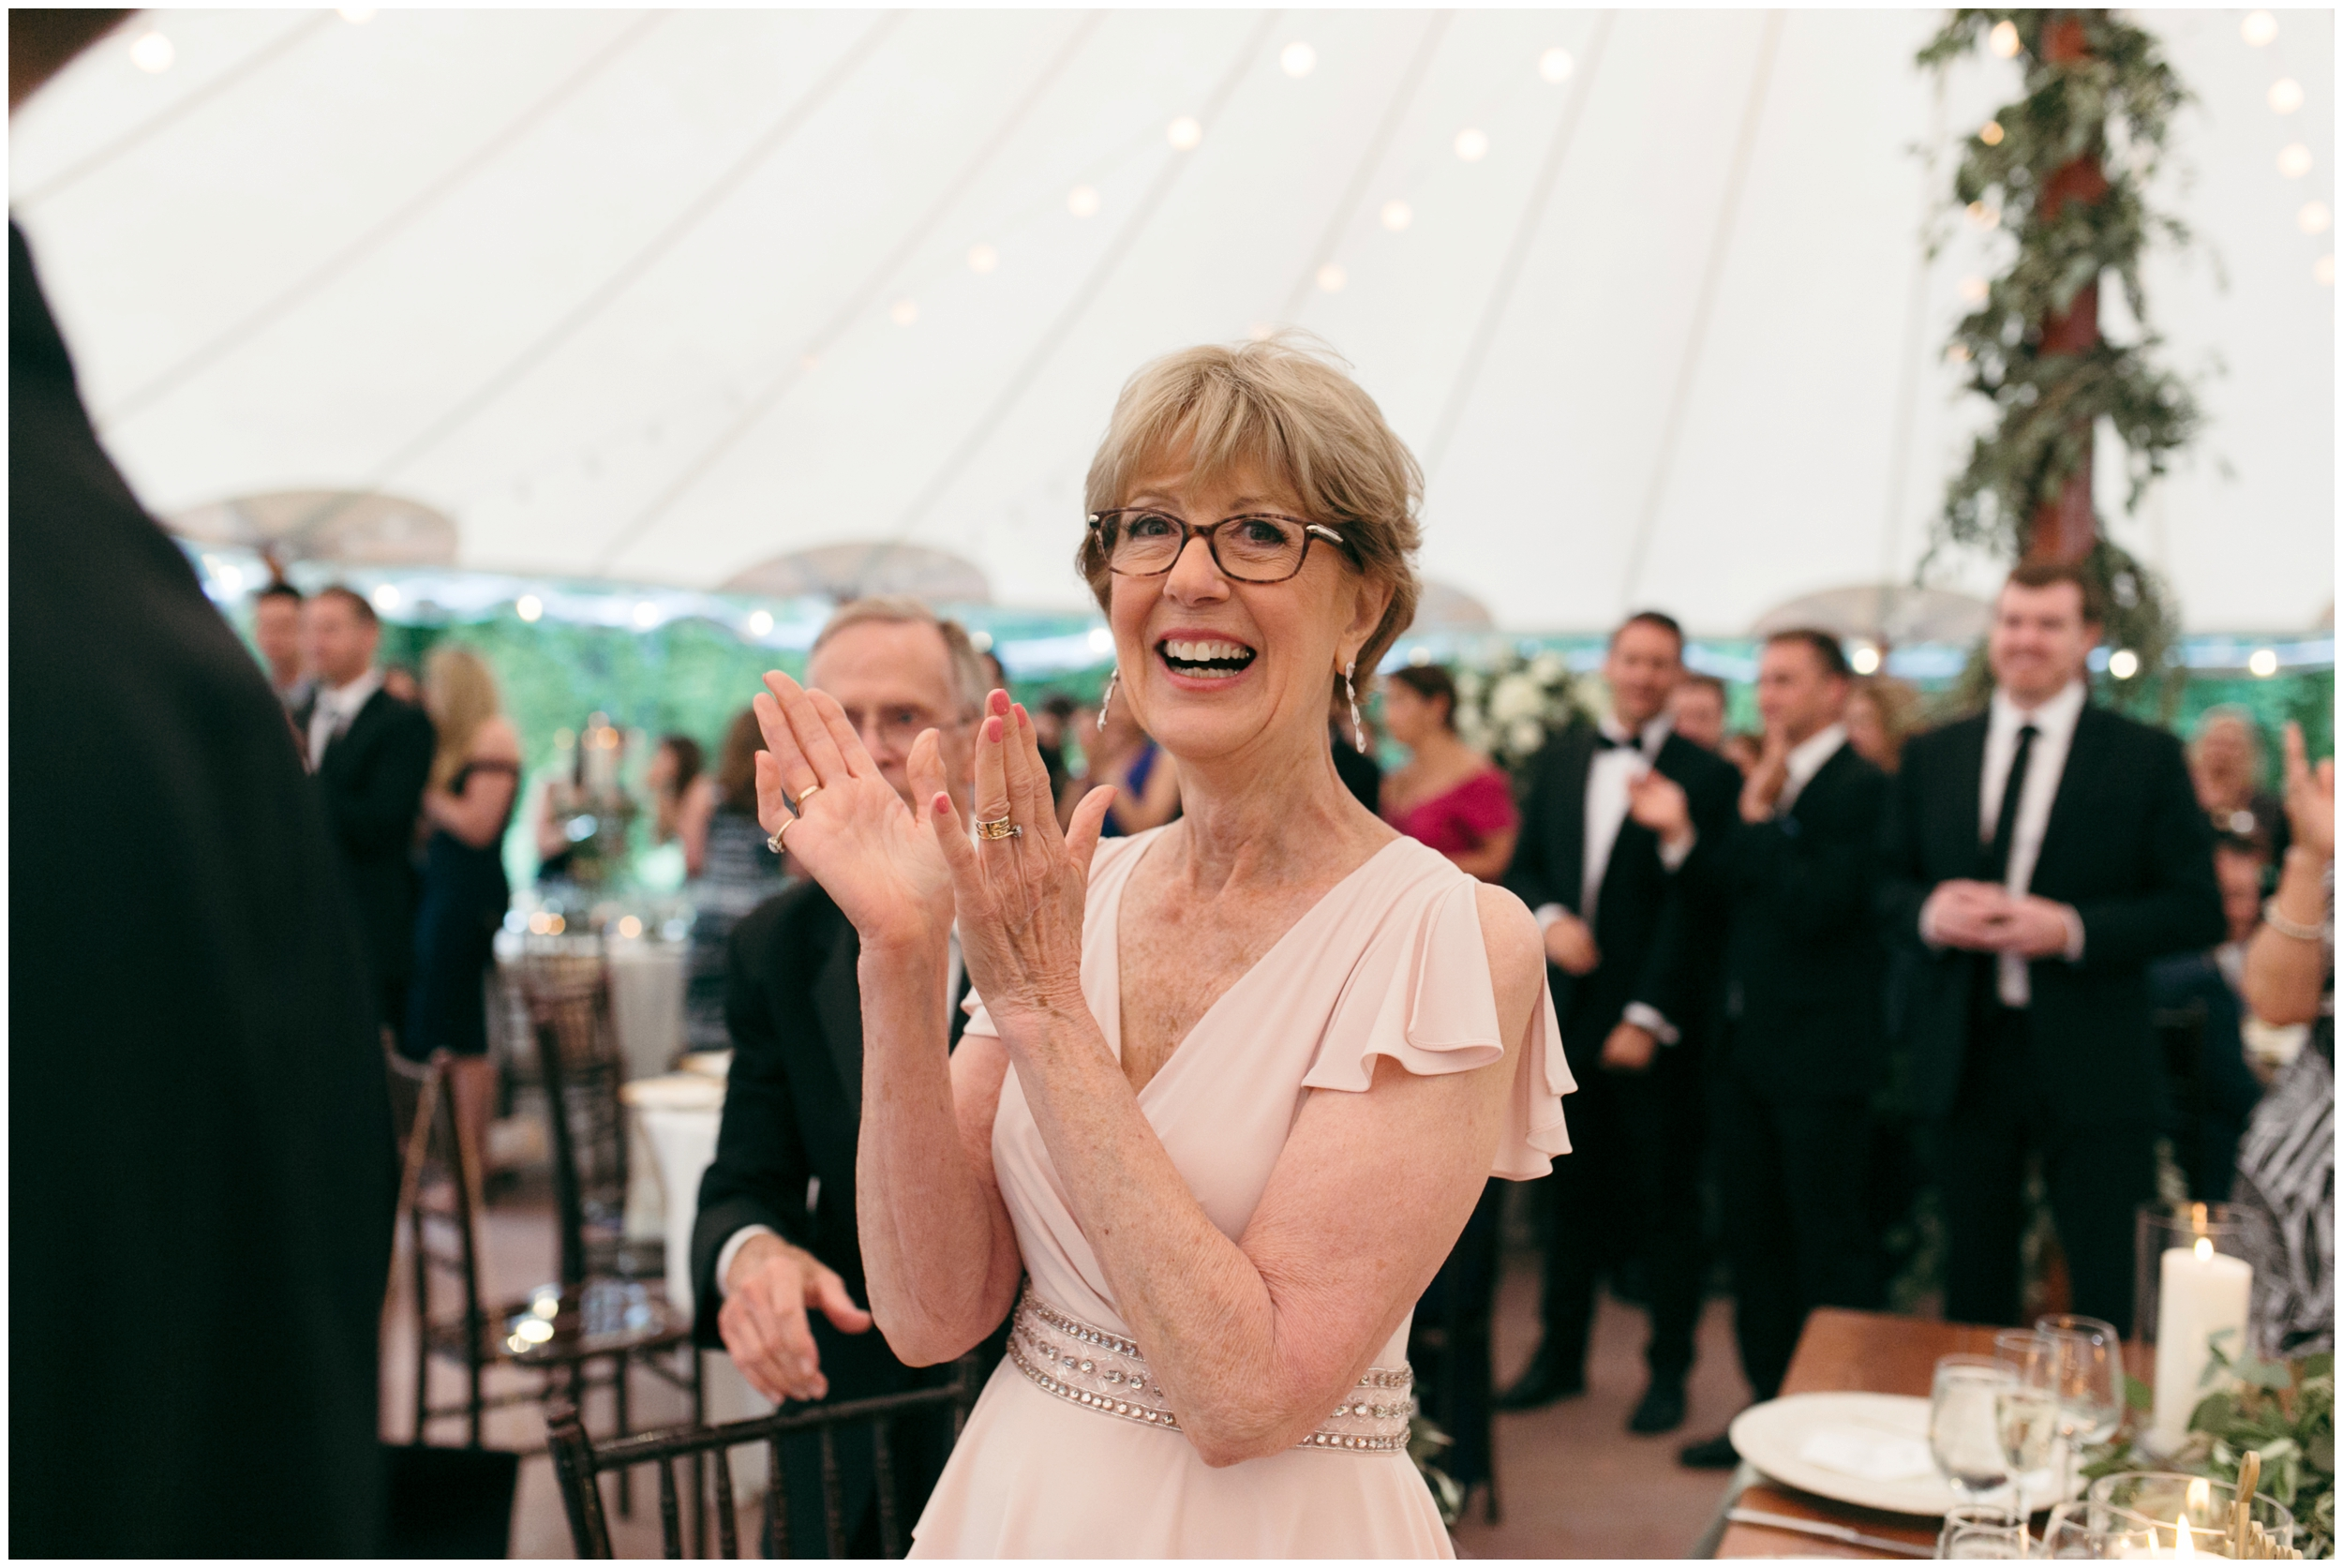 Willowdale-Estate-Wedding-Bailey-Q-Photo-Boston-Wedding-Photographer-074.JPG